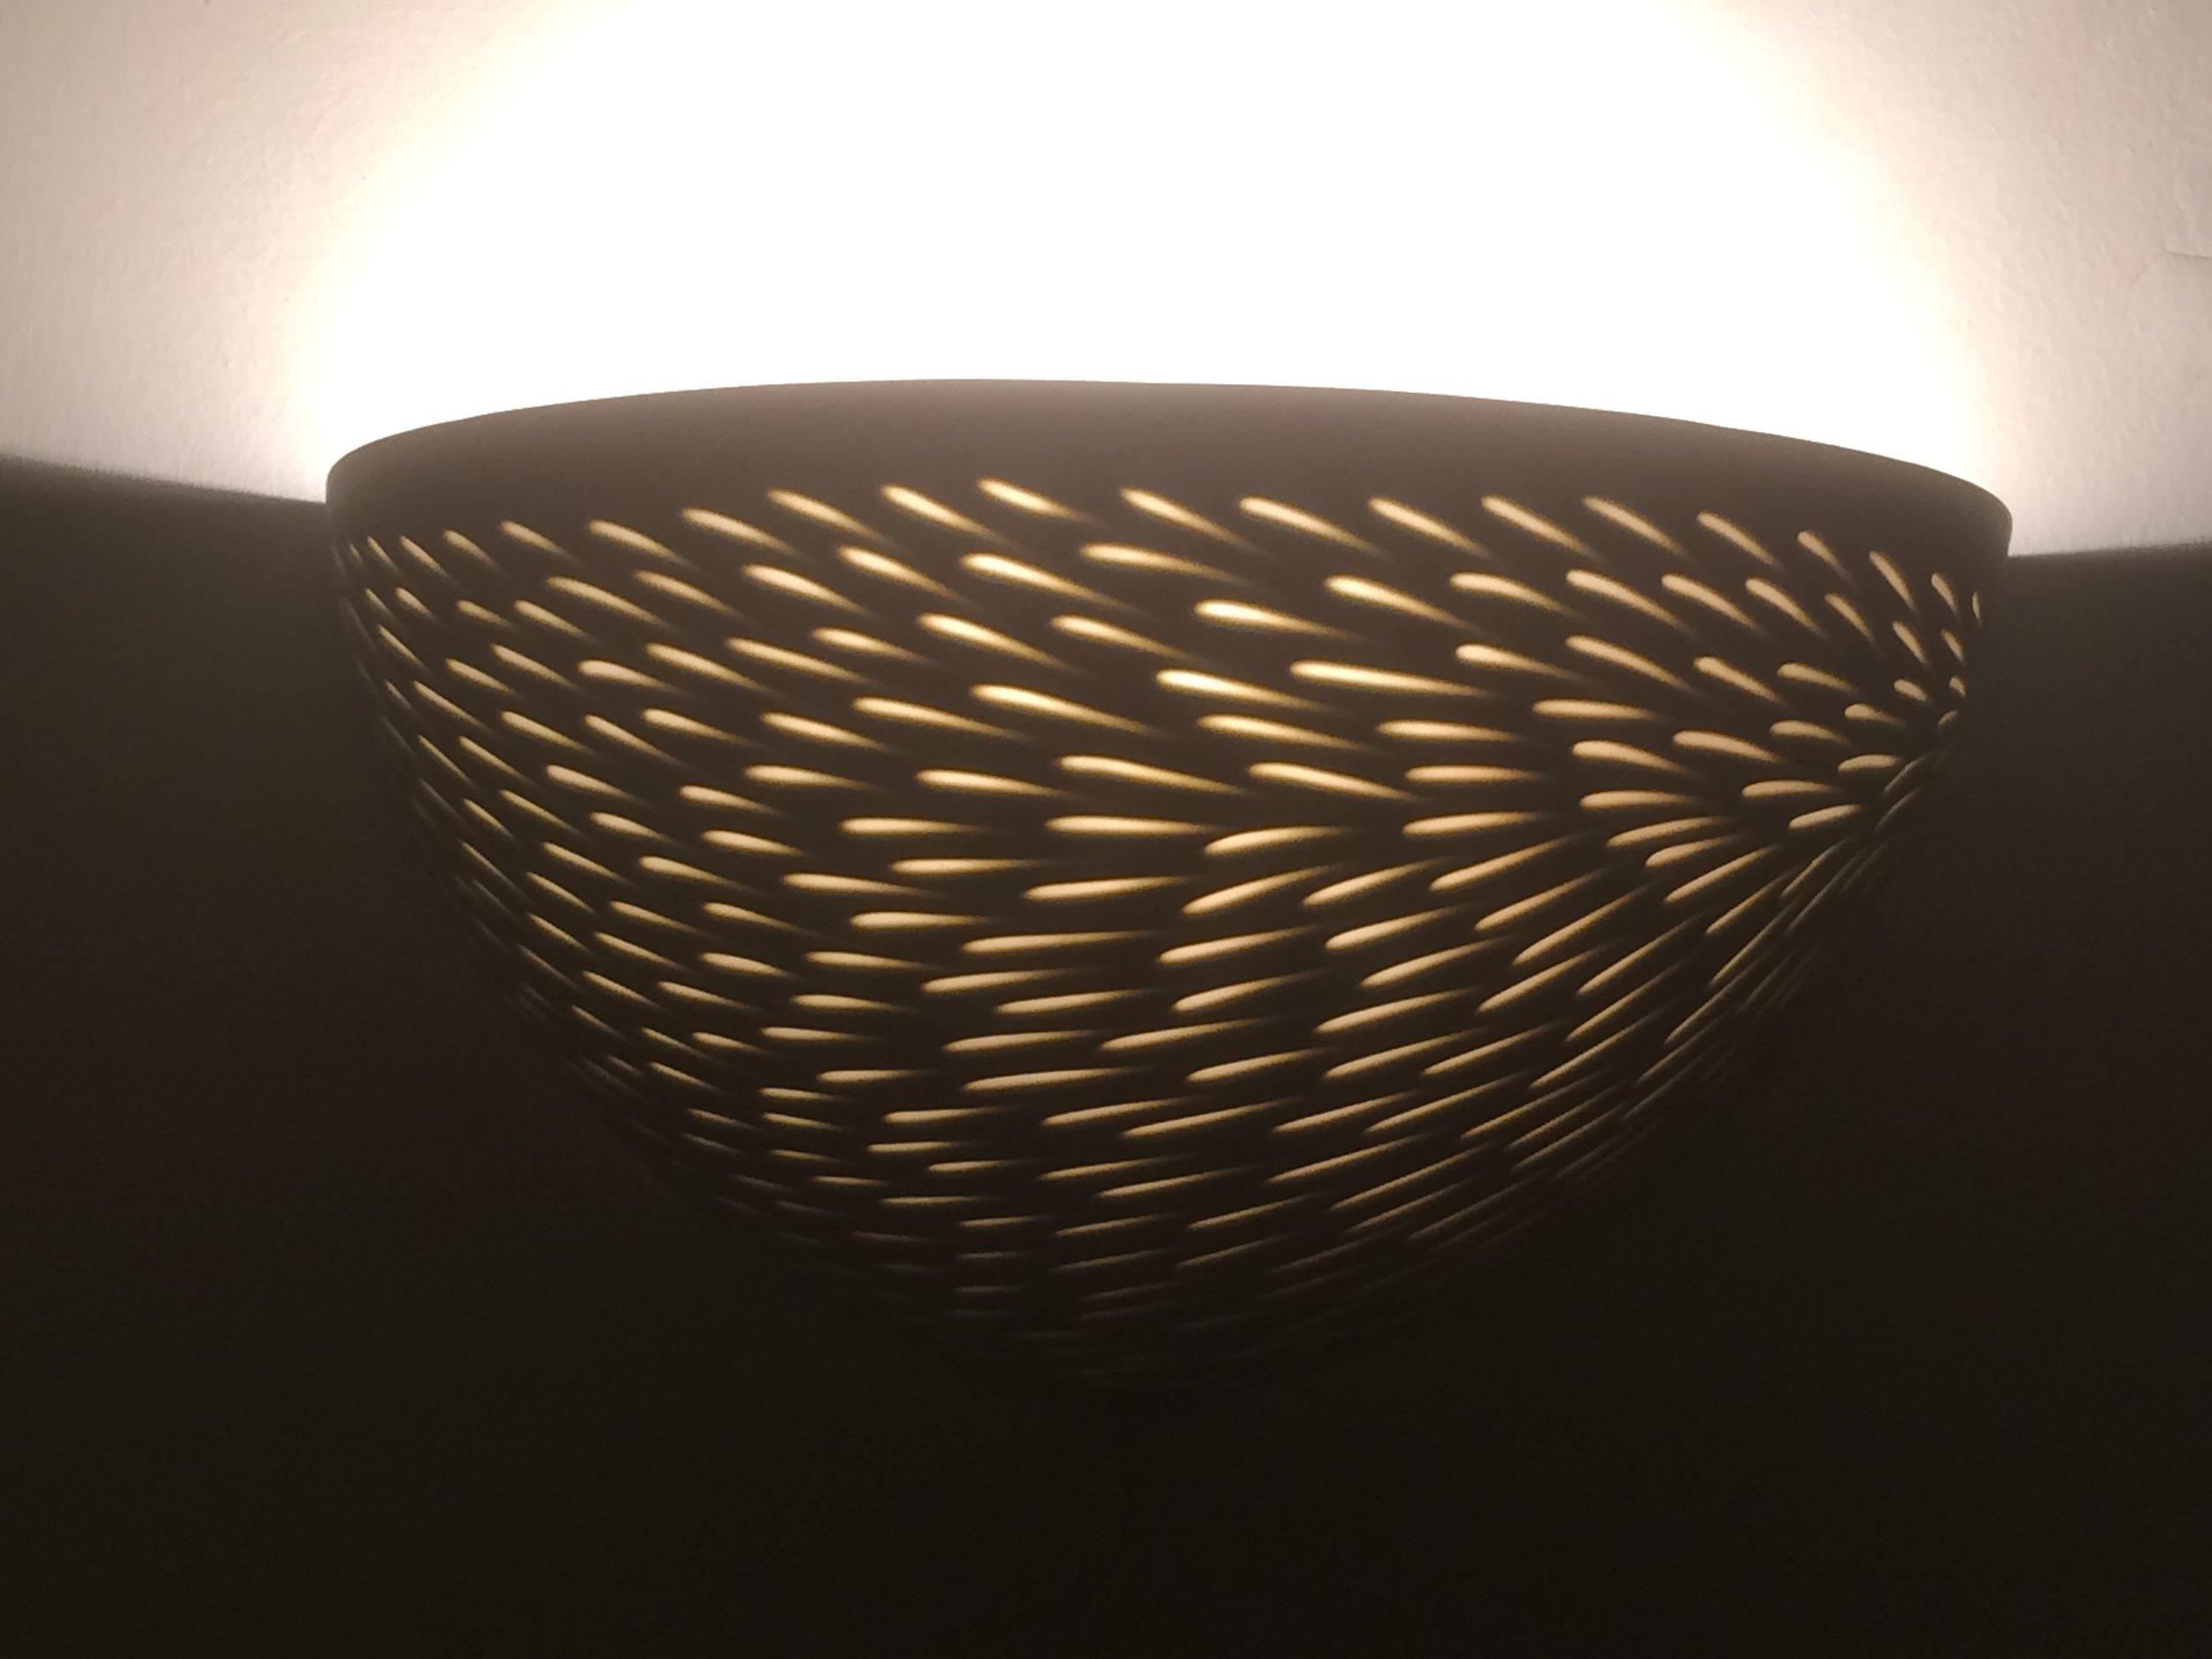 Sepia Taupe'Shoal' Wall light - 25 cm w